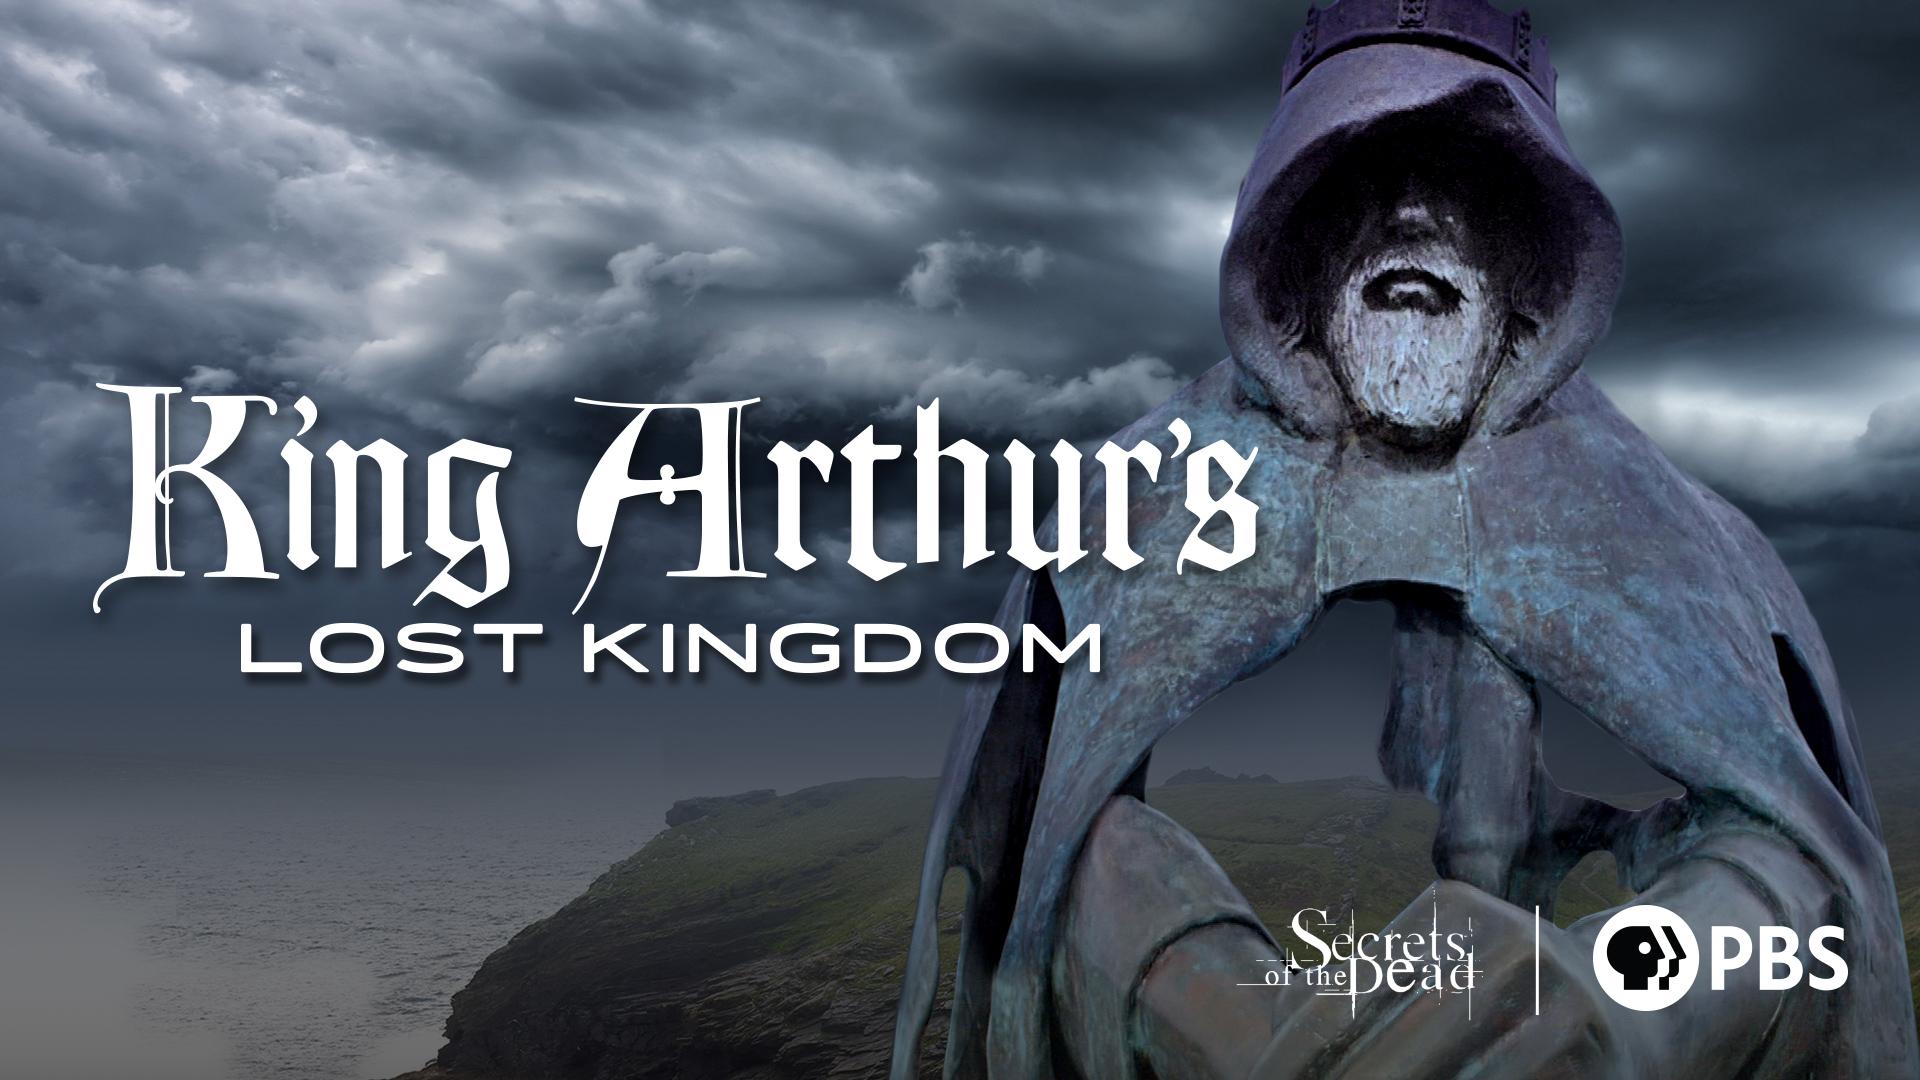 King Arthur's Lost Kingdom